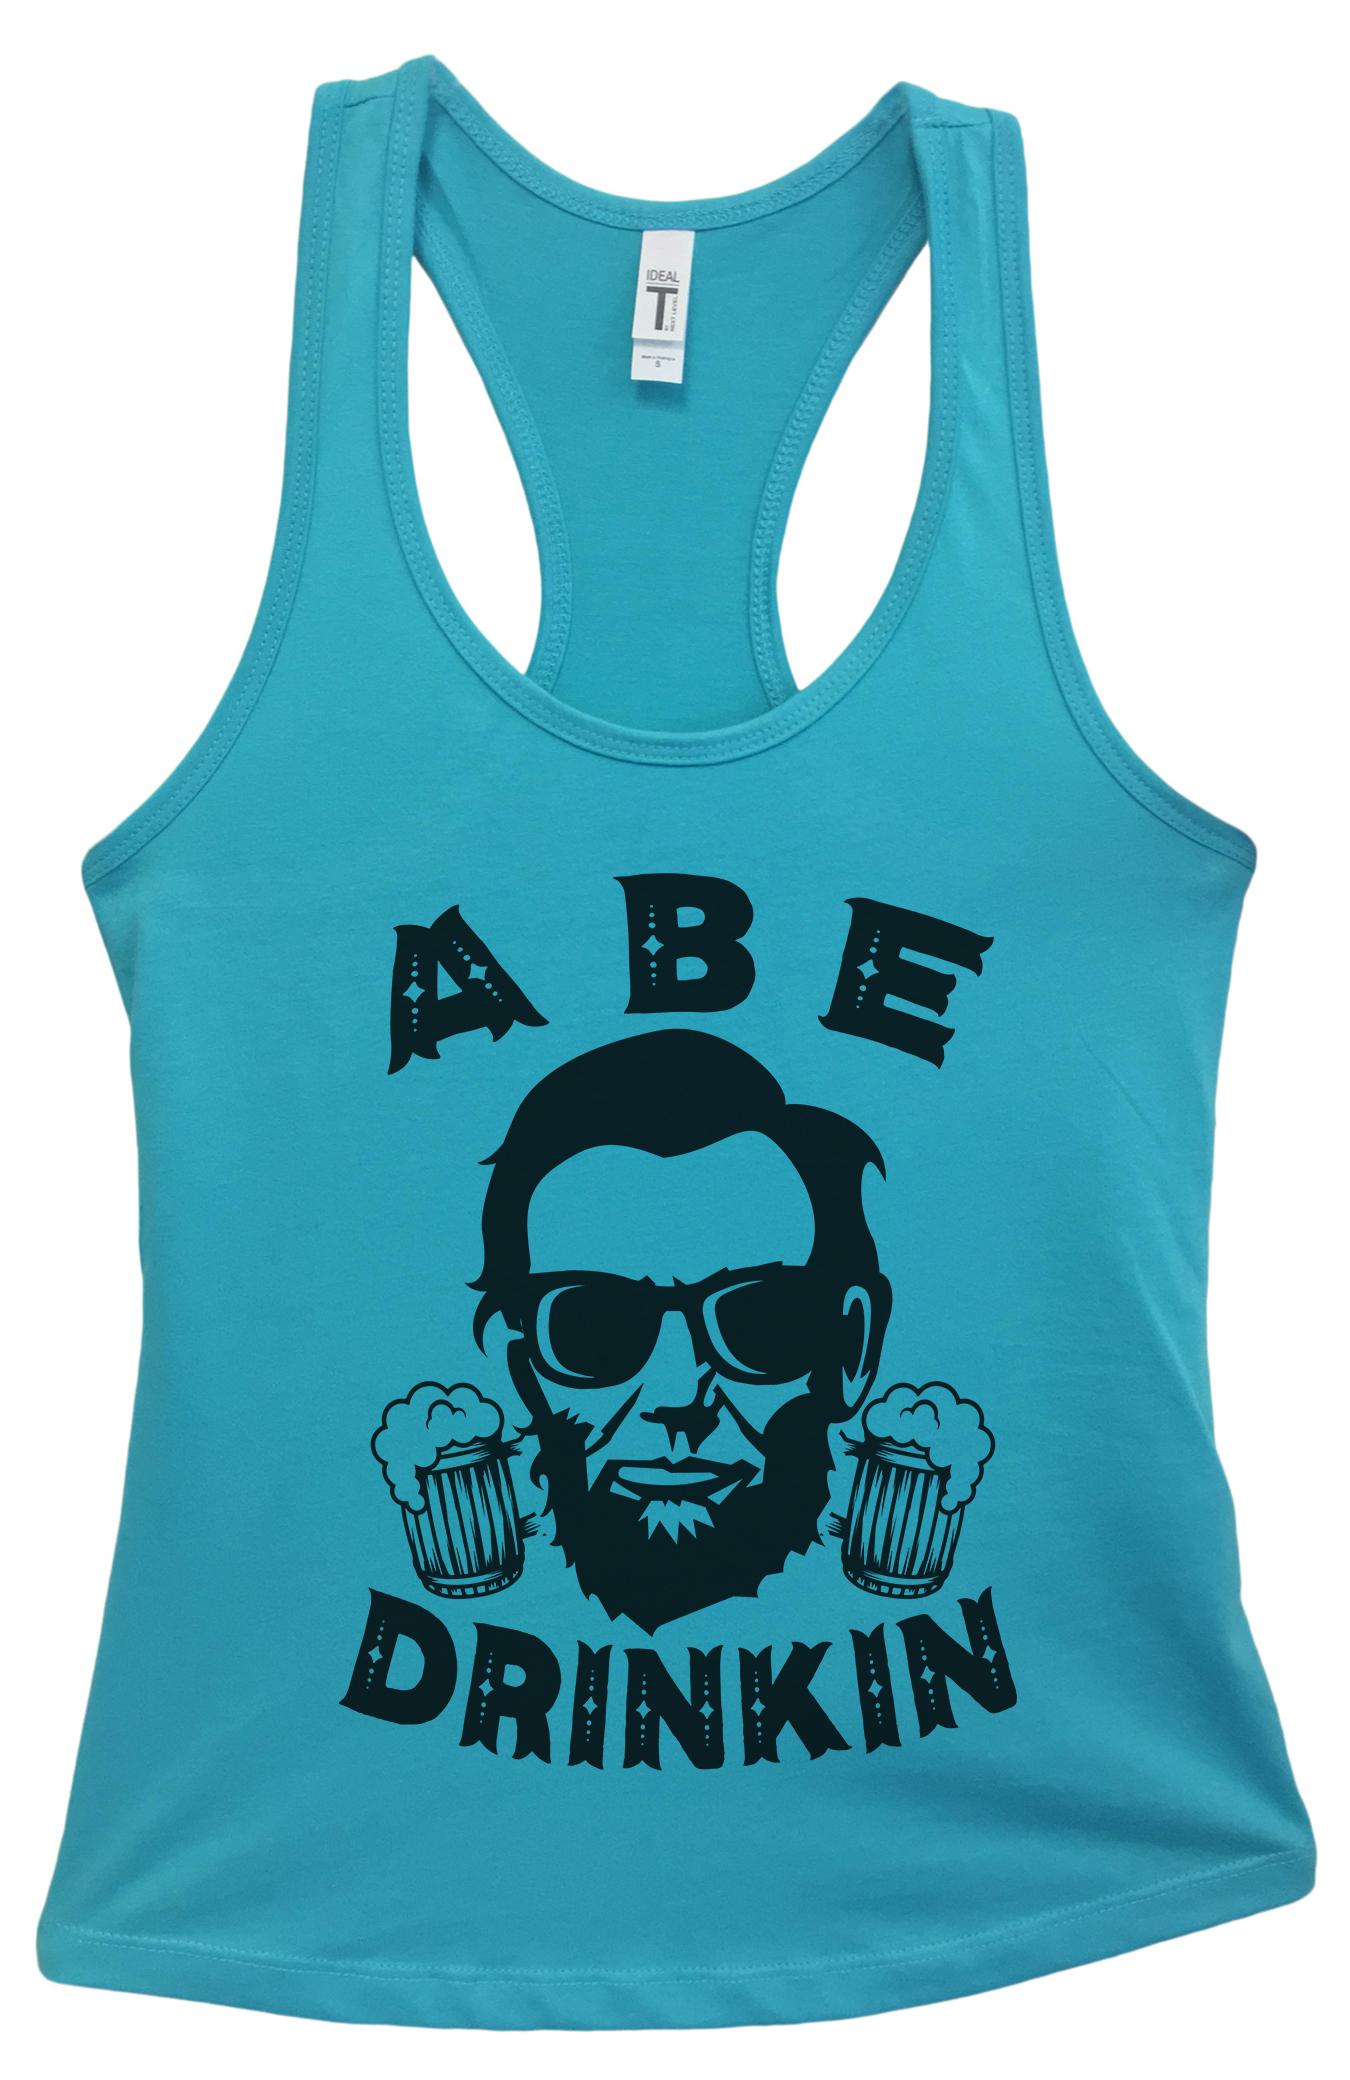 e131bf6dba551 Women s Basic Abraham Lincoln Tank Top